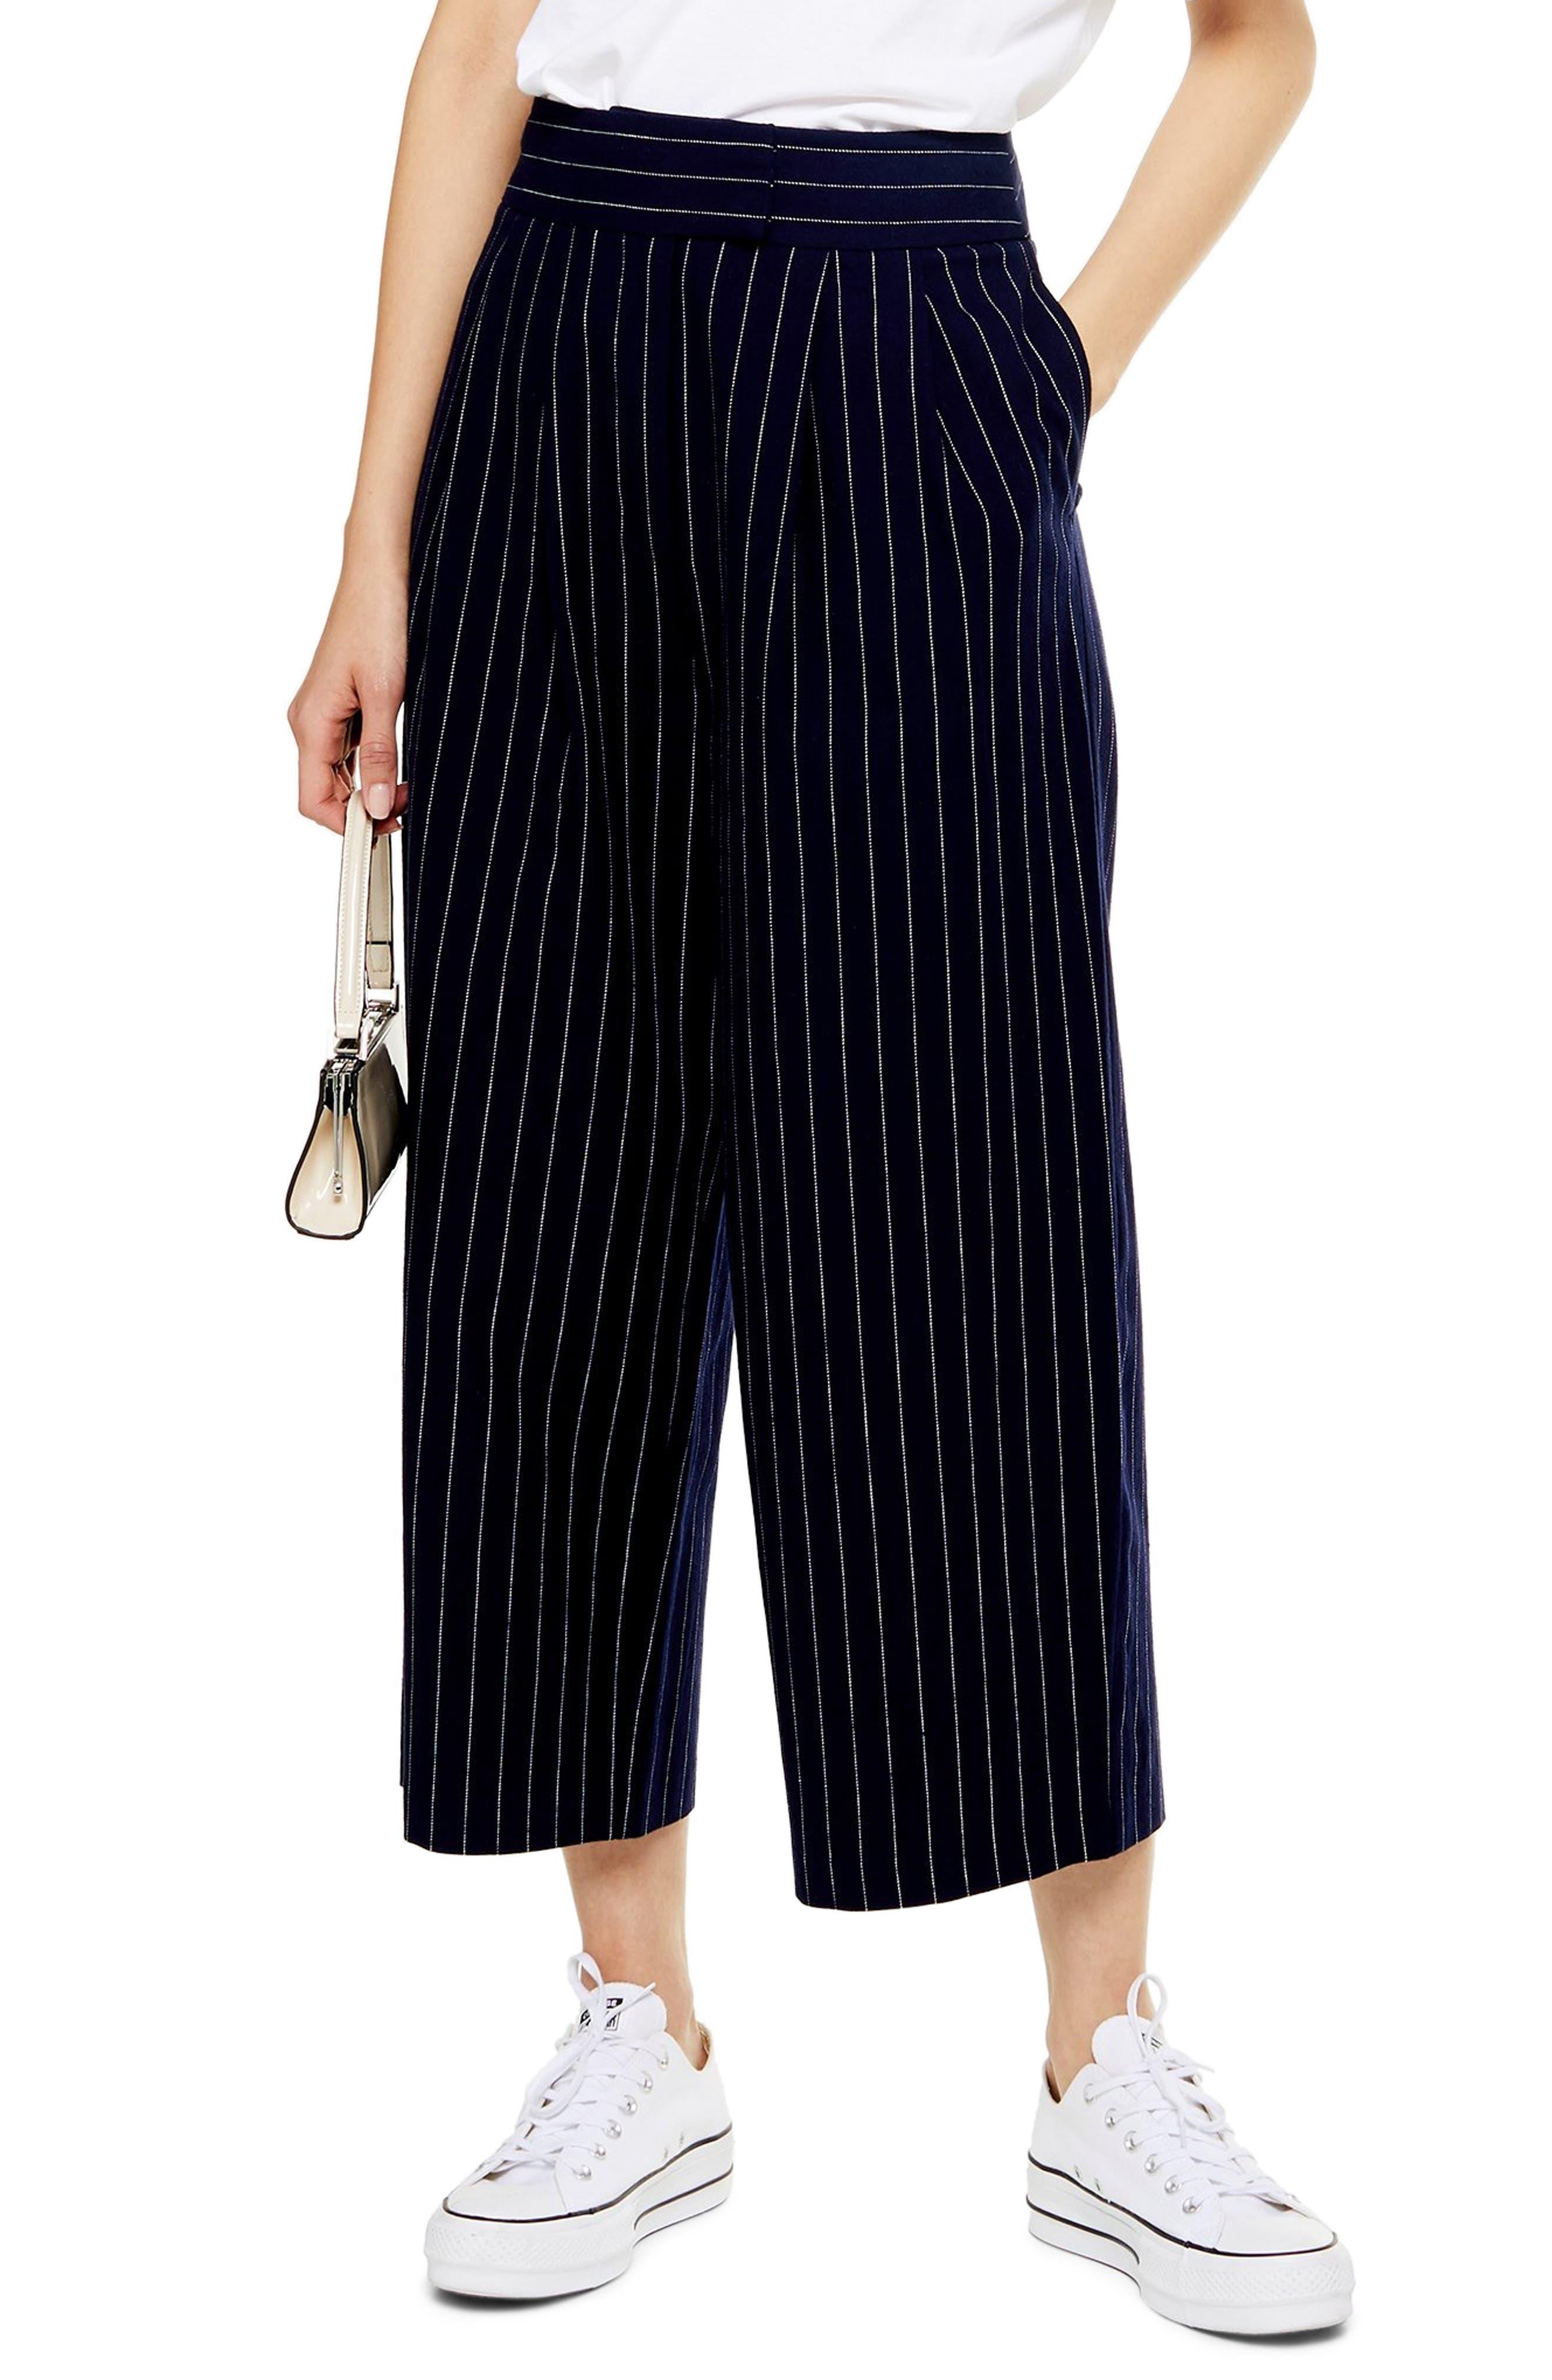 Image of TOPSHOP Pinstripe Crop Wide Leg Cotton & Linen Trousers